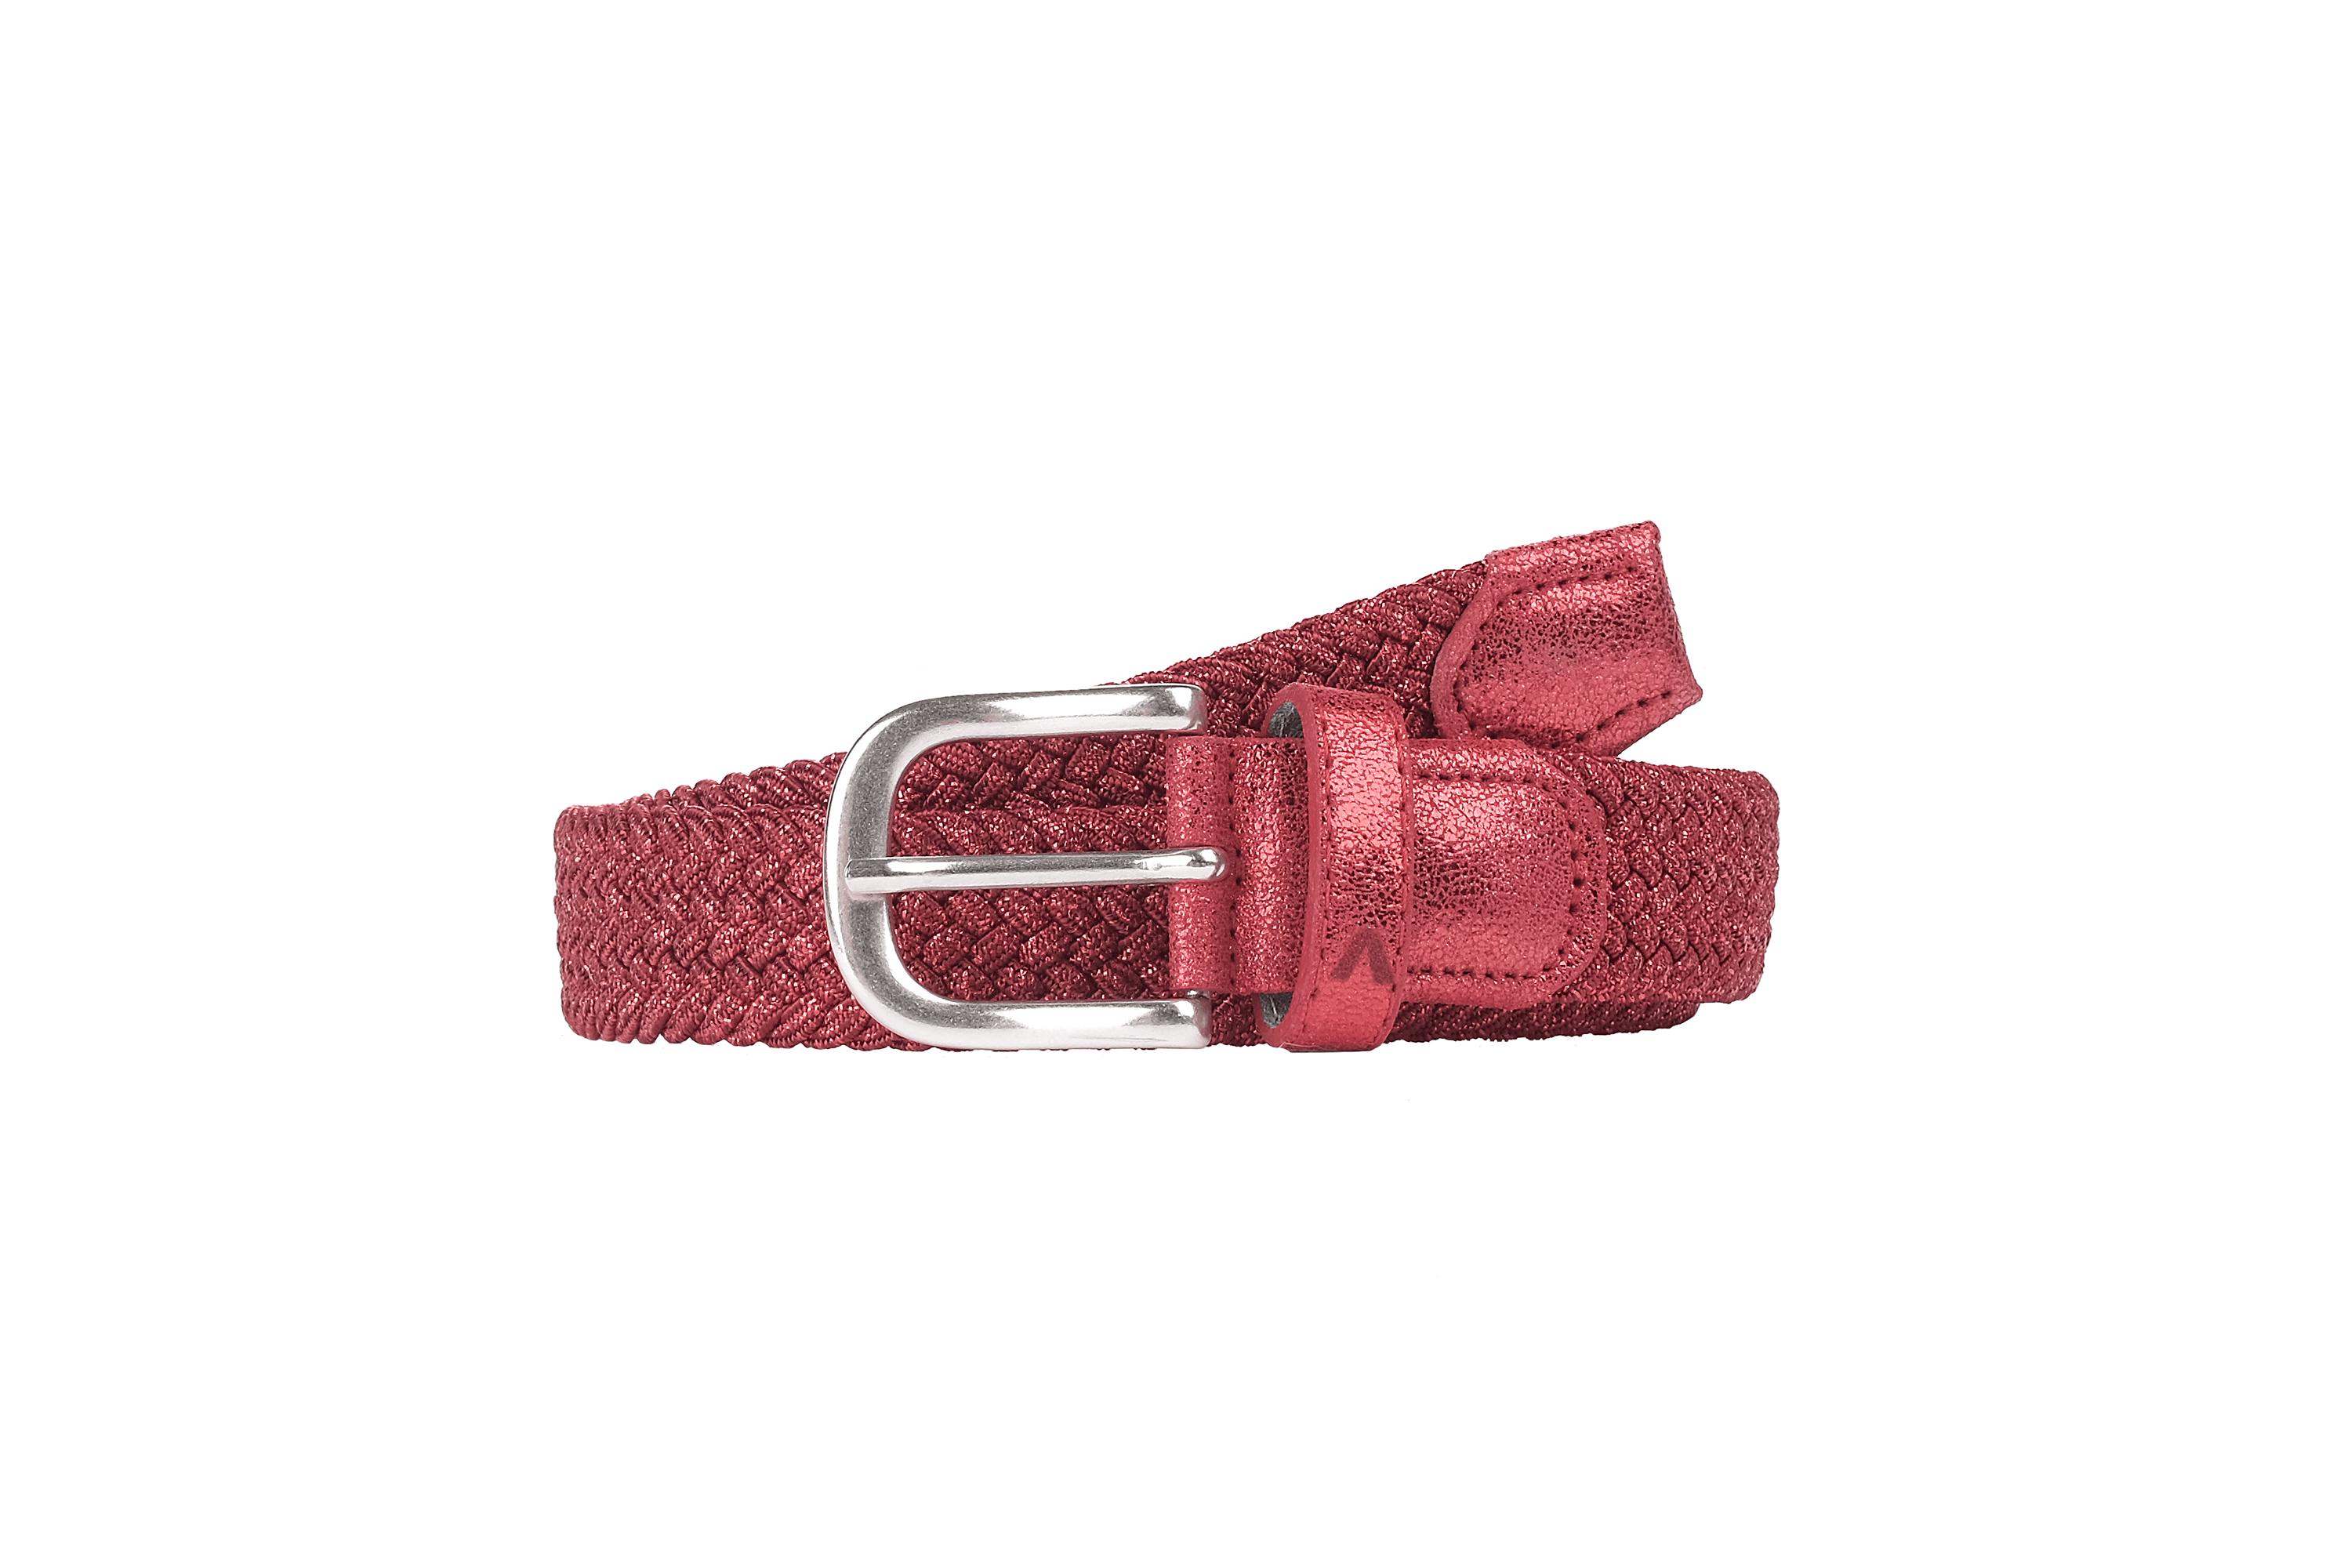 GÜRTEL - Metal Braided